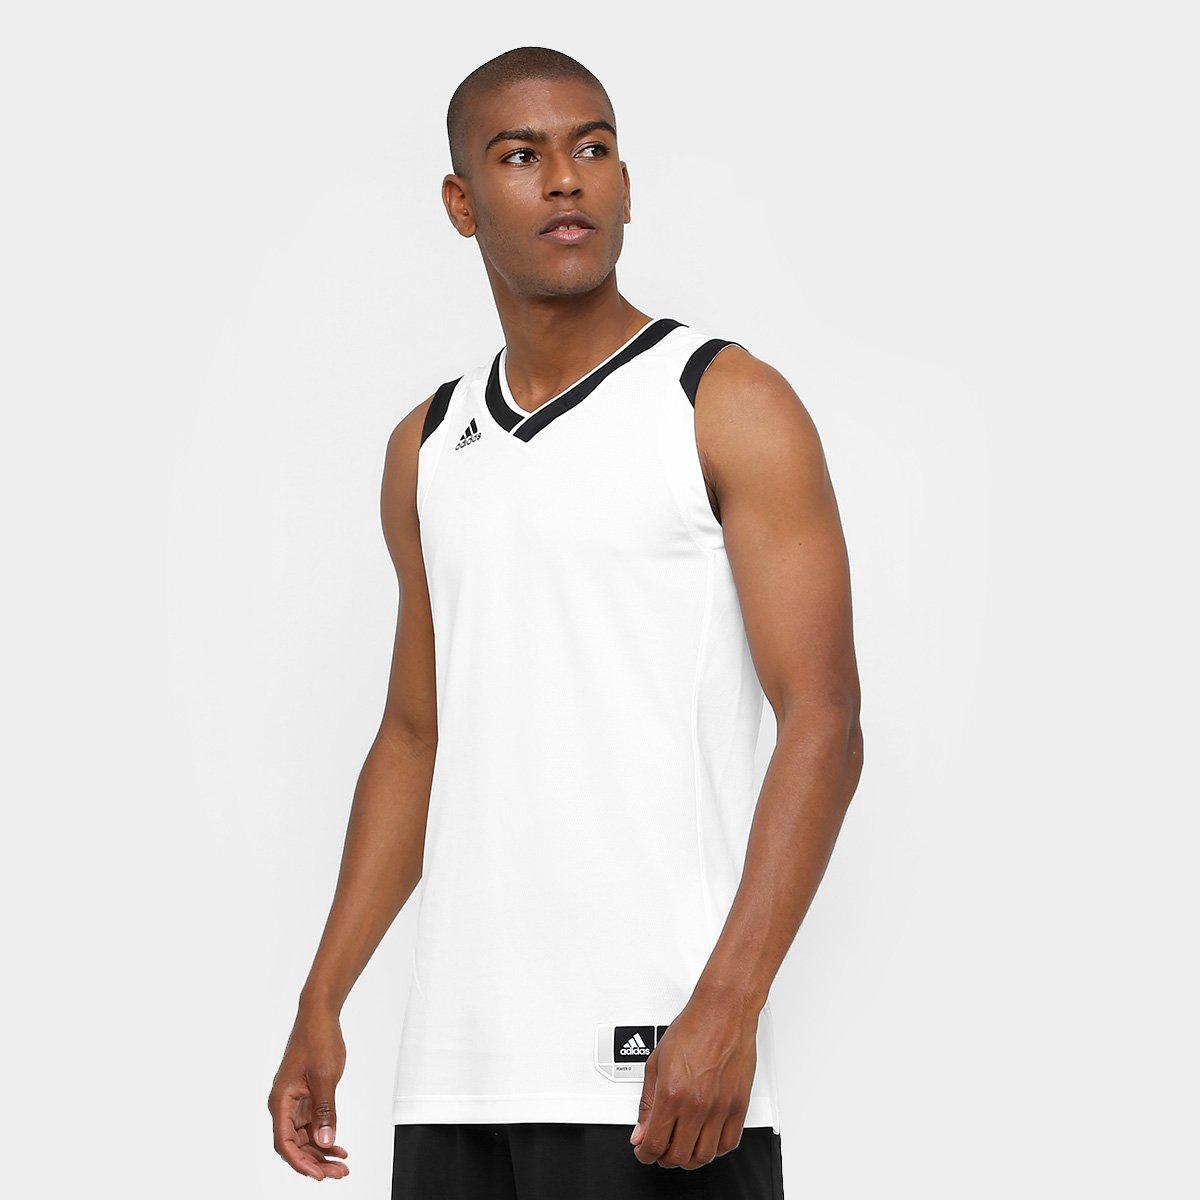 3d59c7c38d Camiseta Regata Adidas Teamstock Masculina